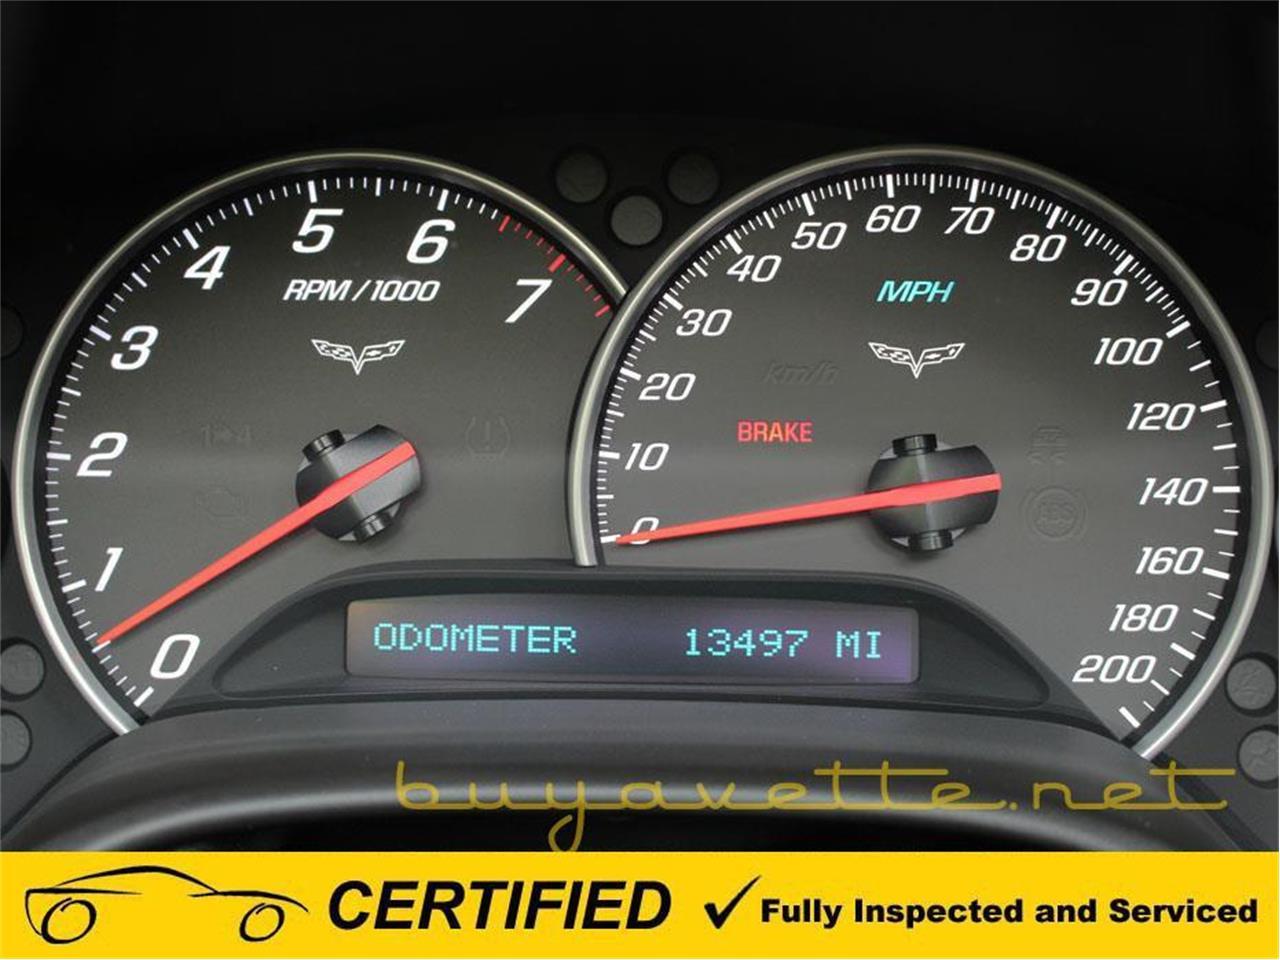 2010 Chevrolet Corvette (CC-1385003) for sale in Atlanta, Georgia